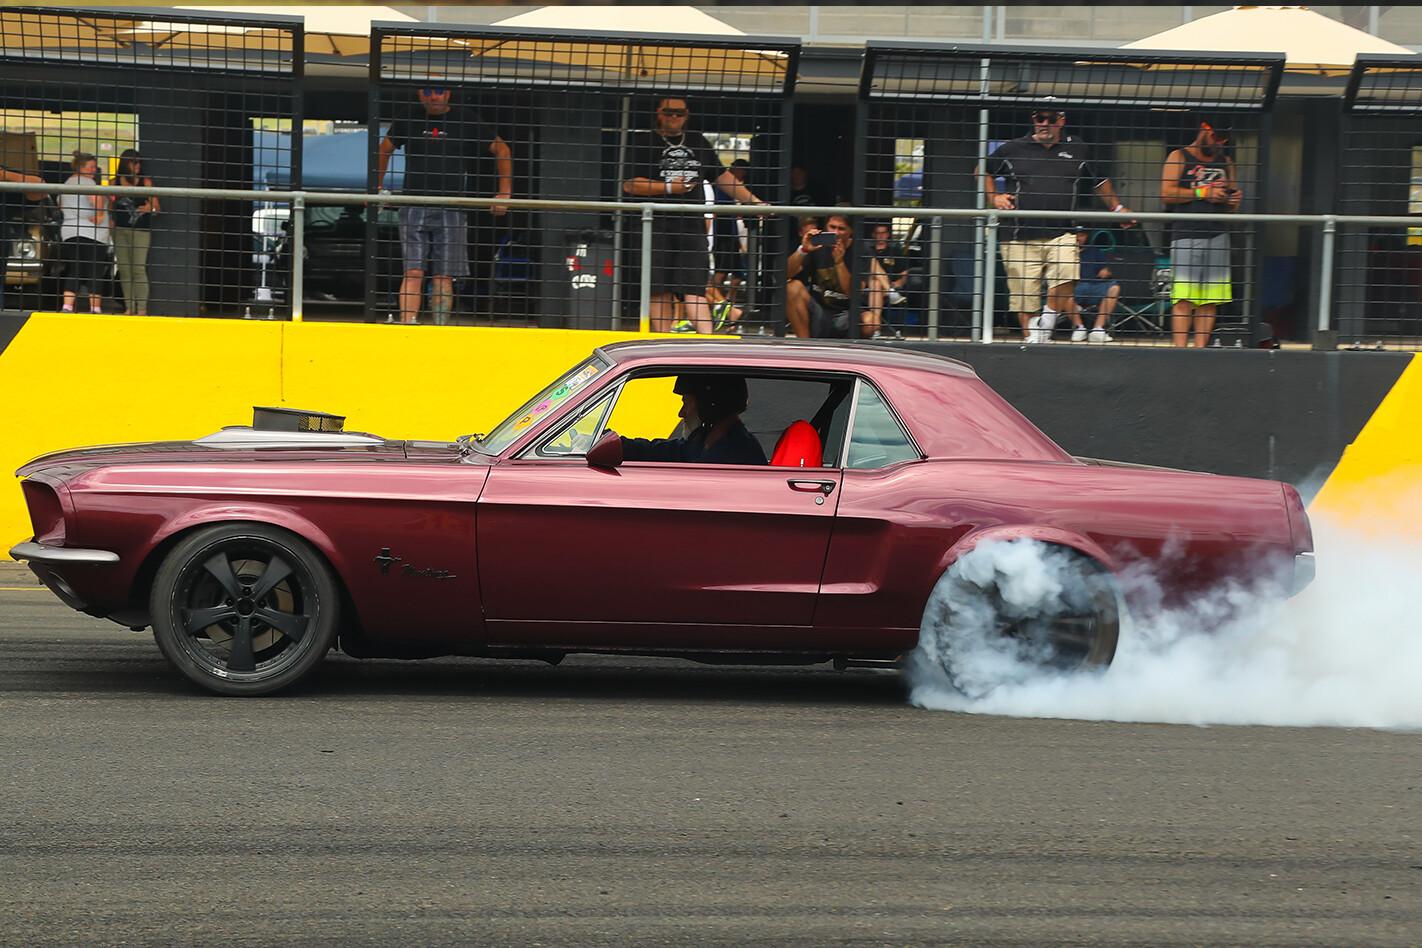 Adrian Morton's Mustang at Powercruise